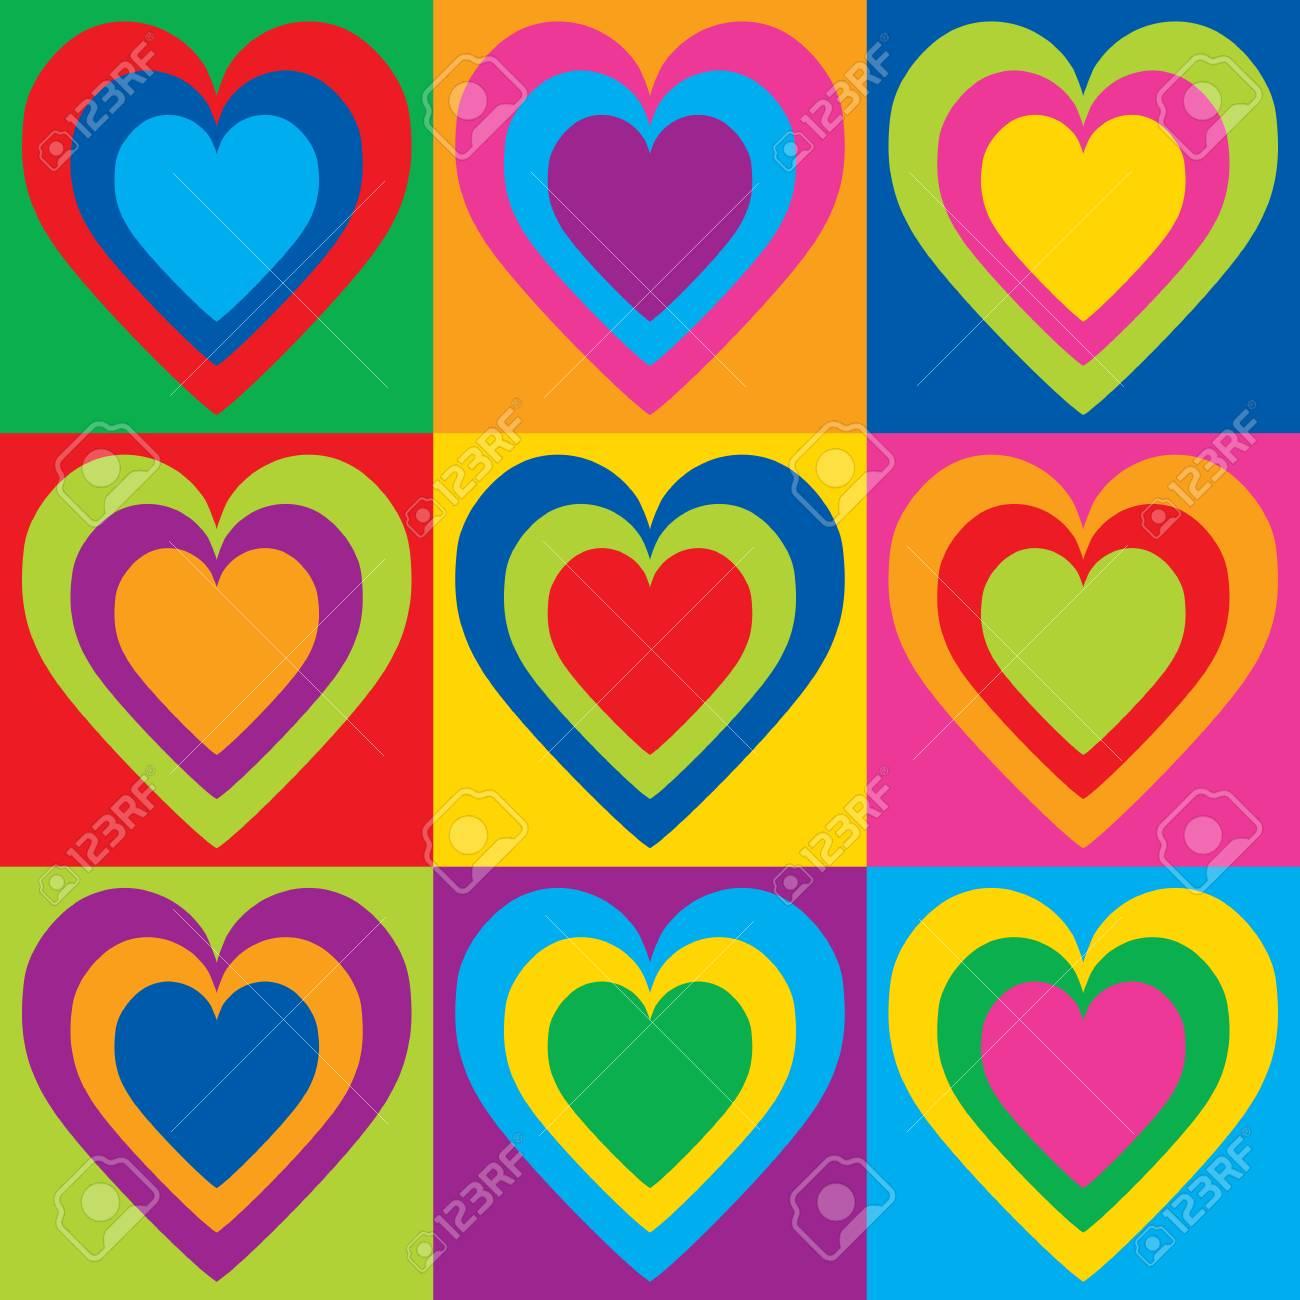 d5b5b8ad7 Pop Art Hearts in a colorful checkerboard design. Stock Vector - 90032240